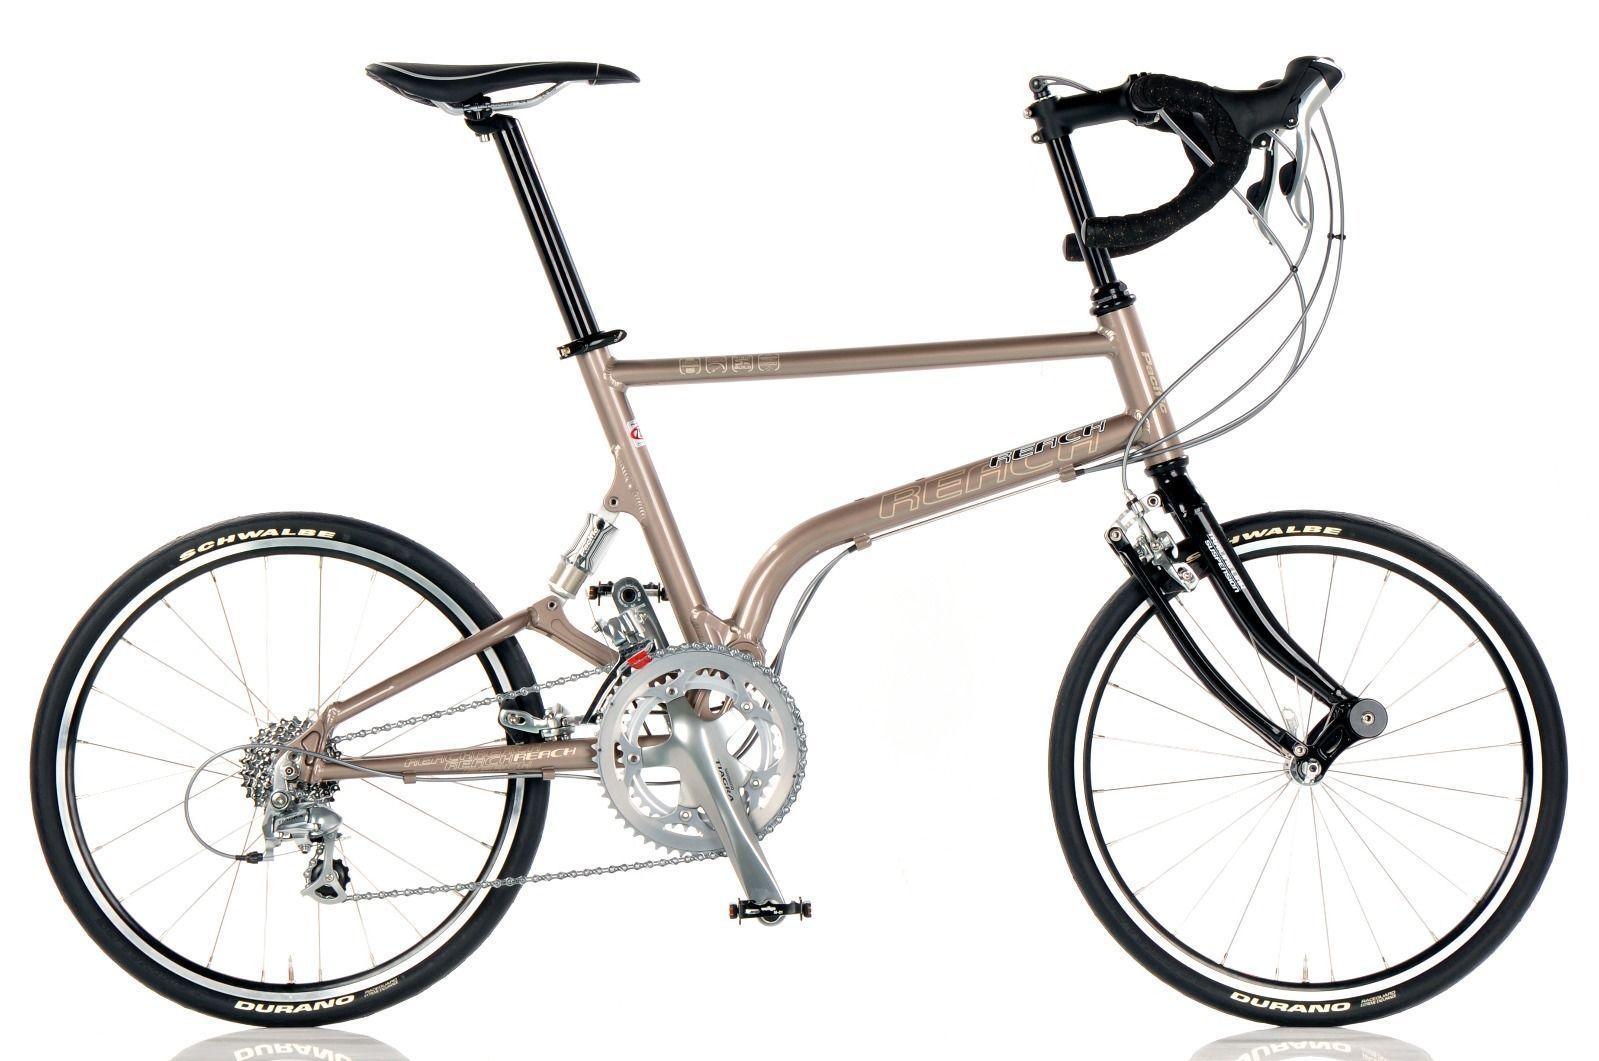 Latest Brompton Bike For Sales Bromptonbike Brompton Brompton M6l Flame Lacquer 2019 Folding Bike Worldwide Post 1953 44 End Date Sunday Mar 24 2019 6 26